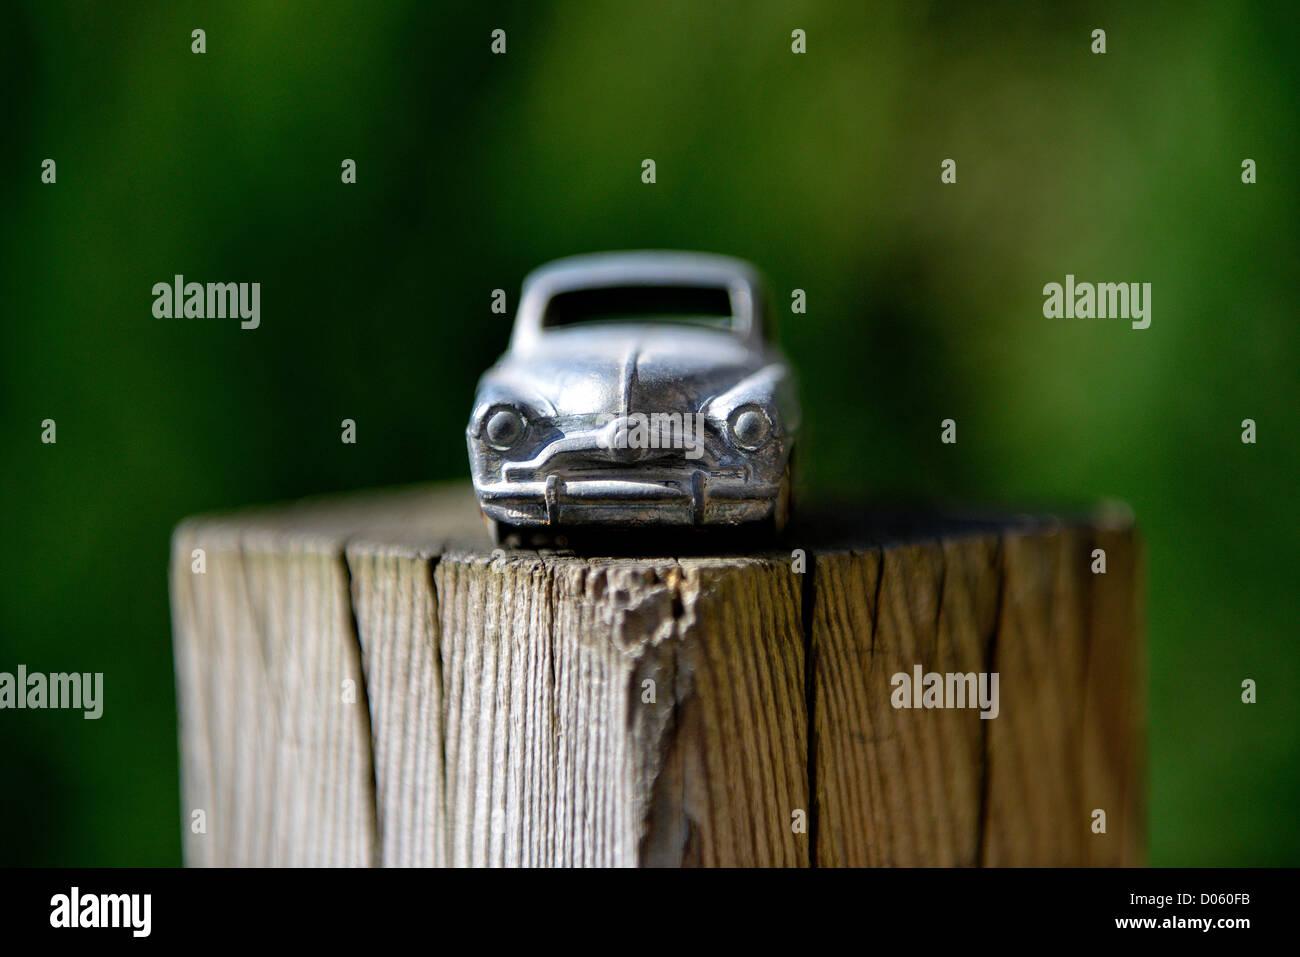 Meccano Toy Stock Photos Images Alamy 1951 Simca Wiring Diagram Car On A Wooden Garden Post 9 Aronde 24u